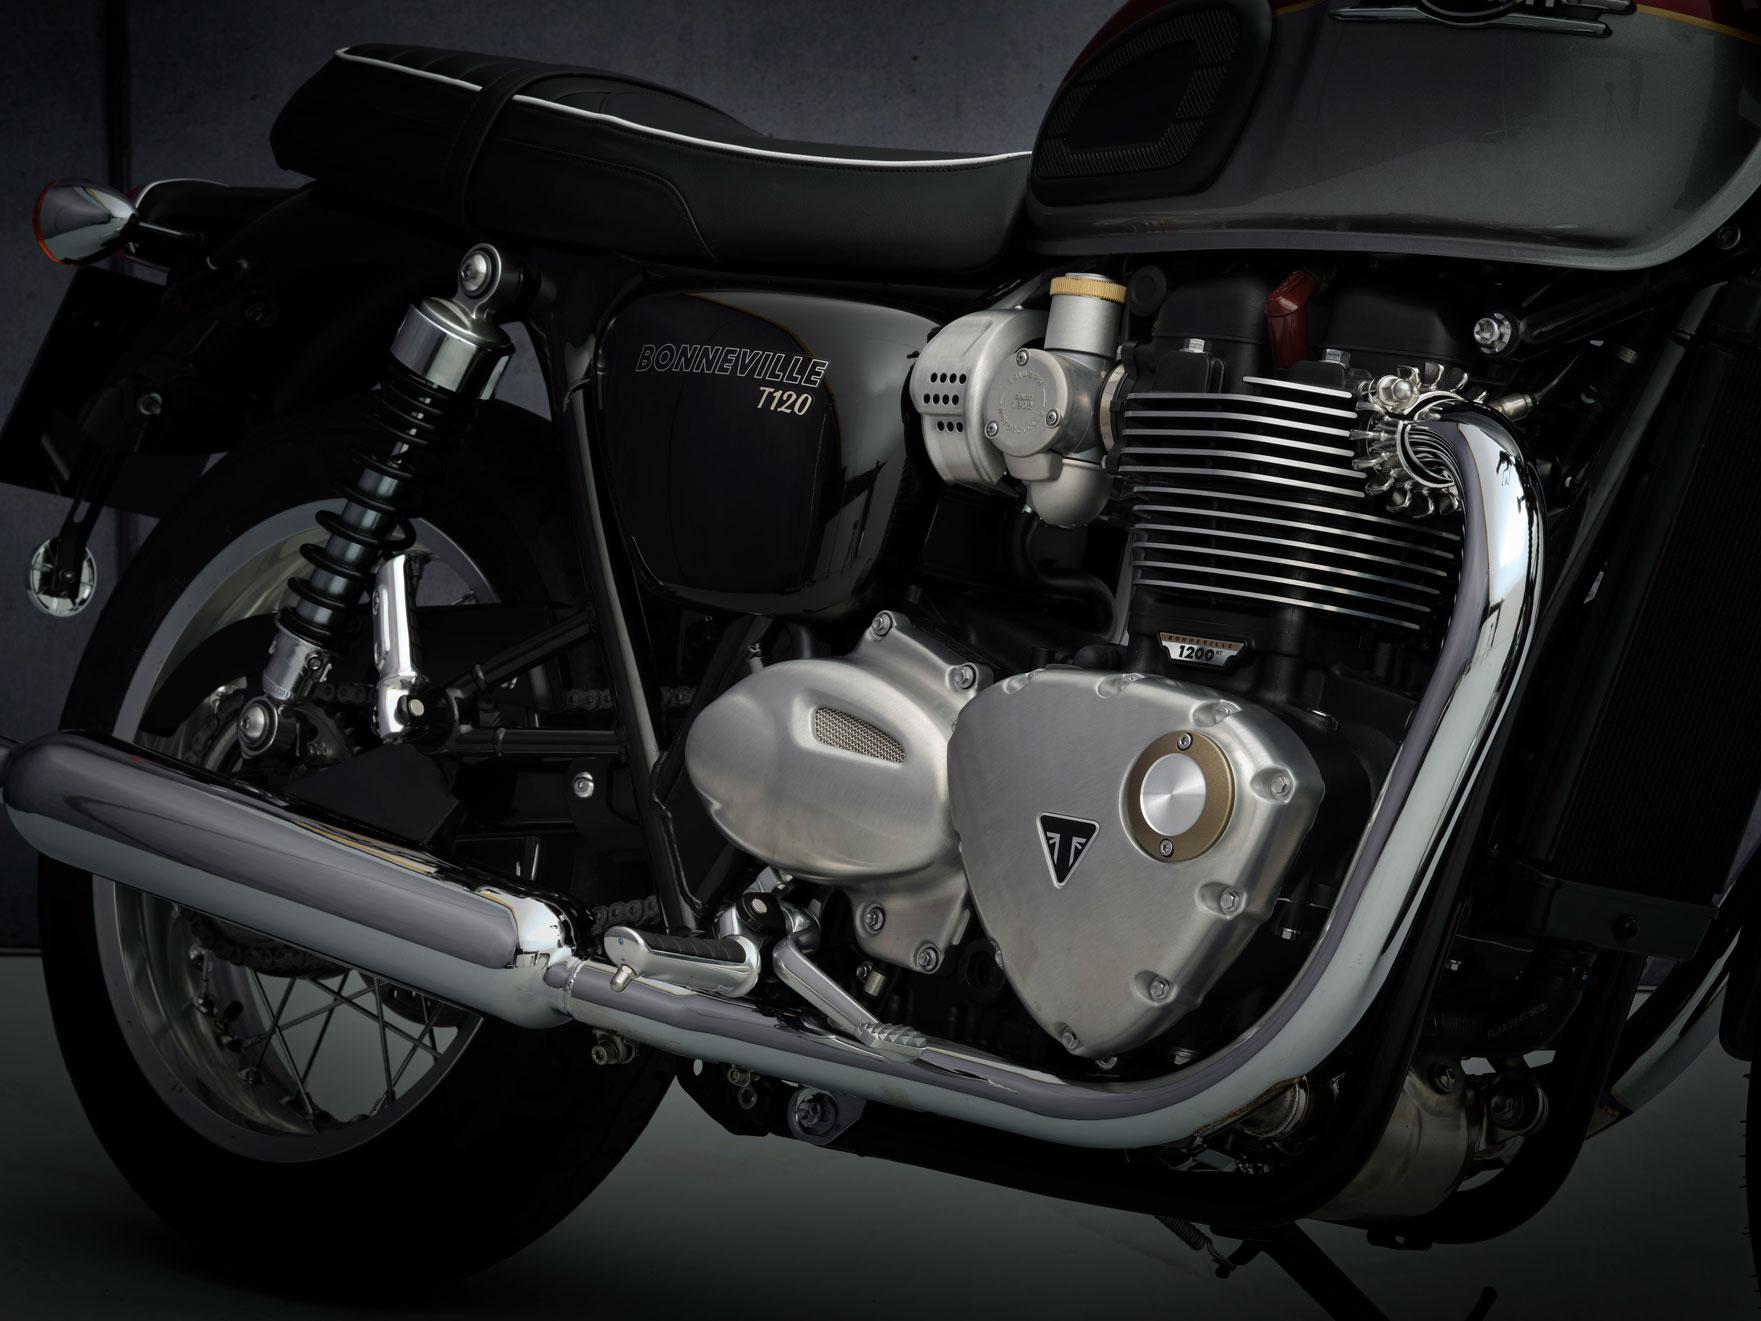 T120_21MY_2100_BR_Details_engine_master